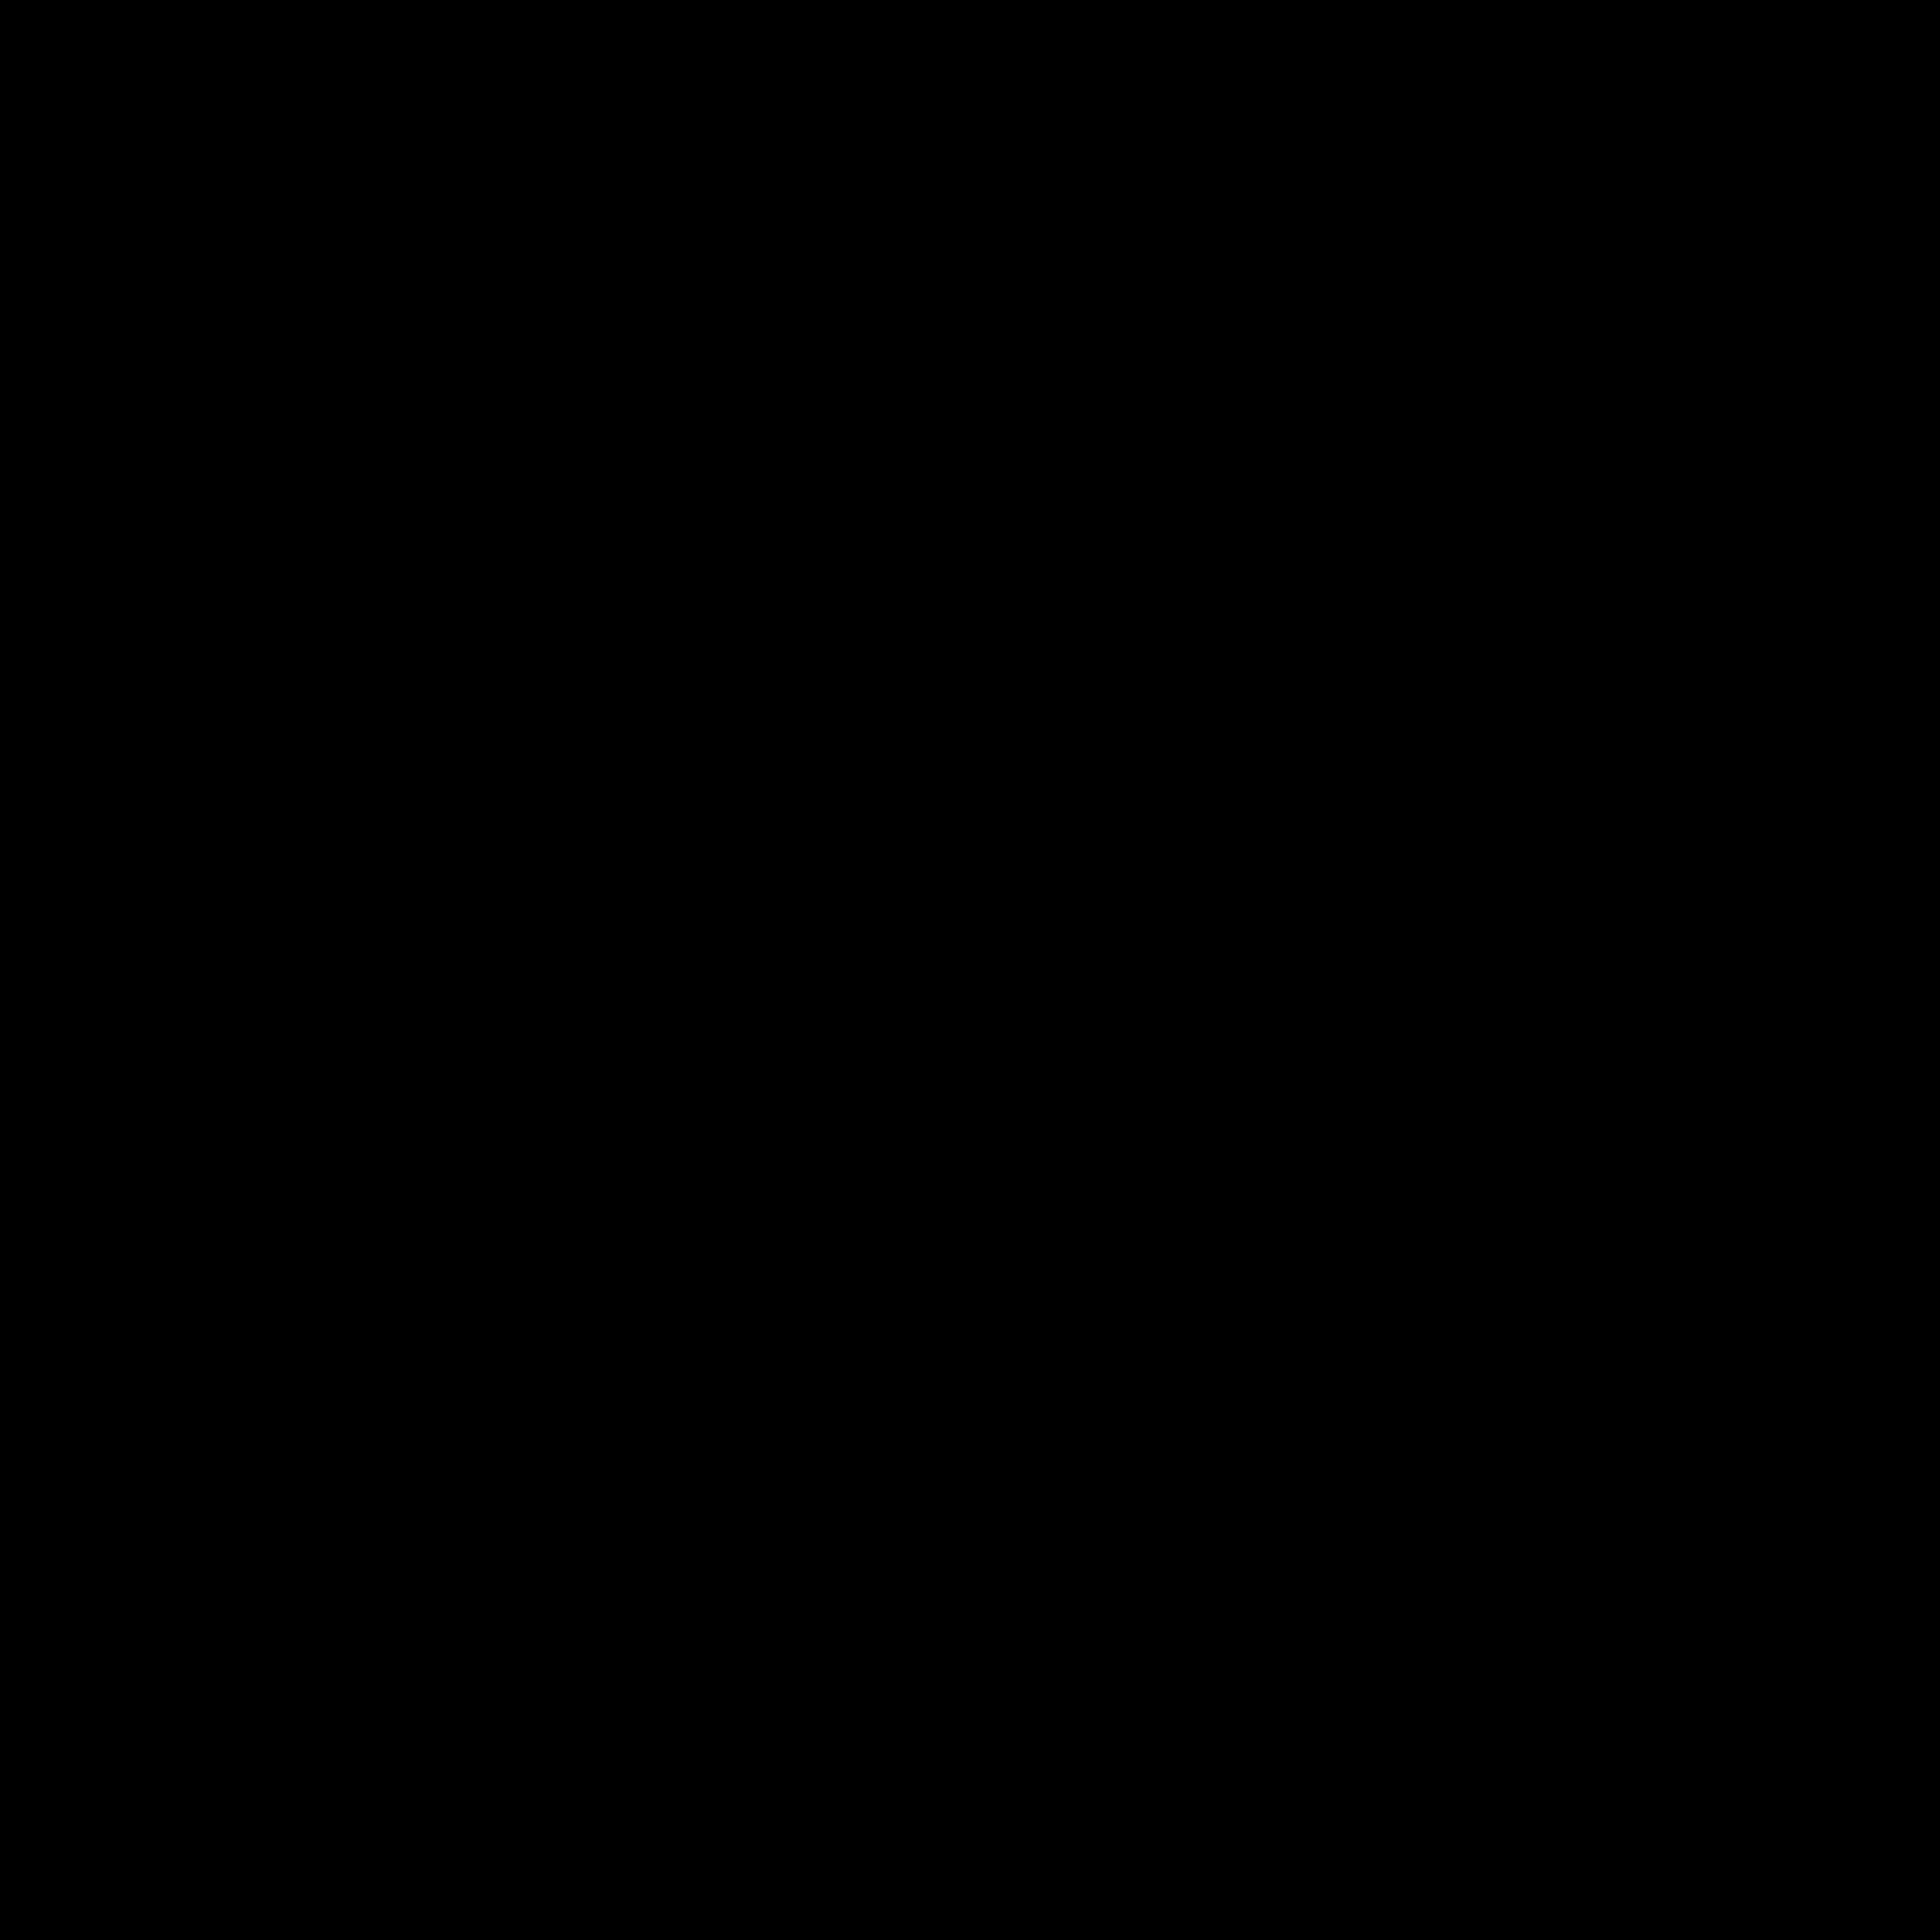 Adecco Interim 01 Logo PNG Transparent & SVG Vector.